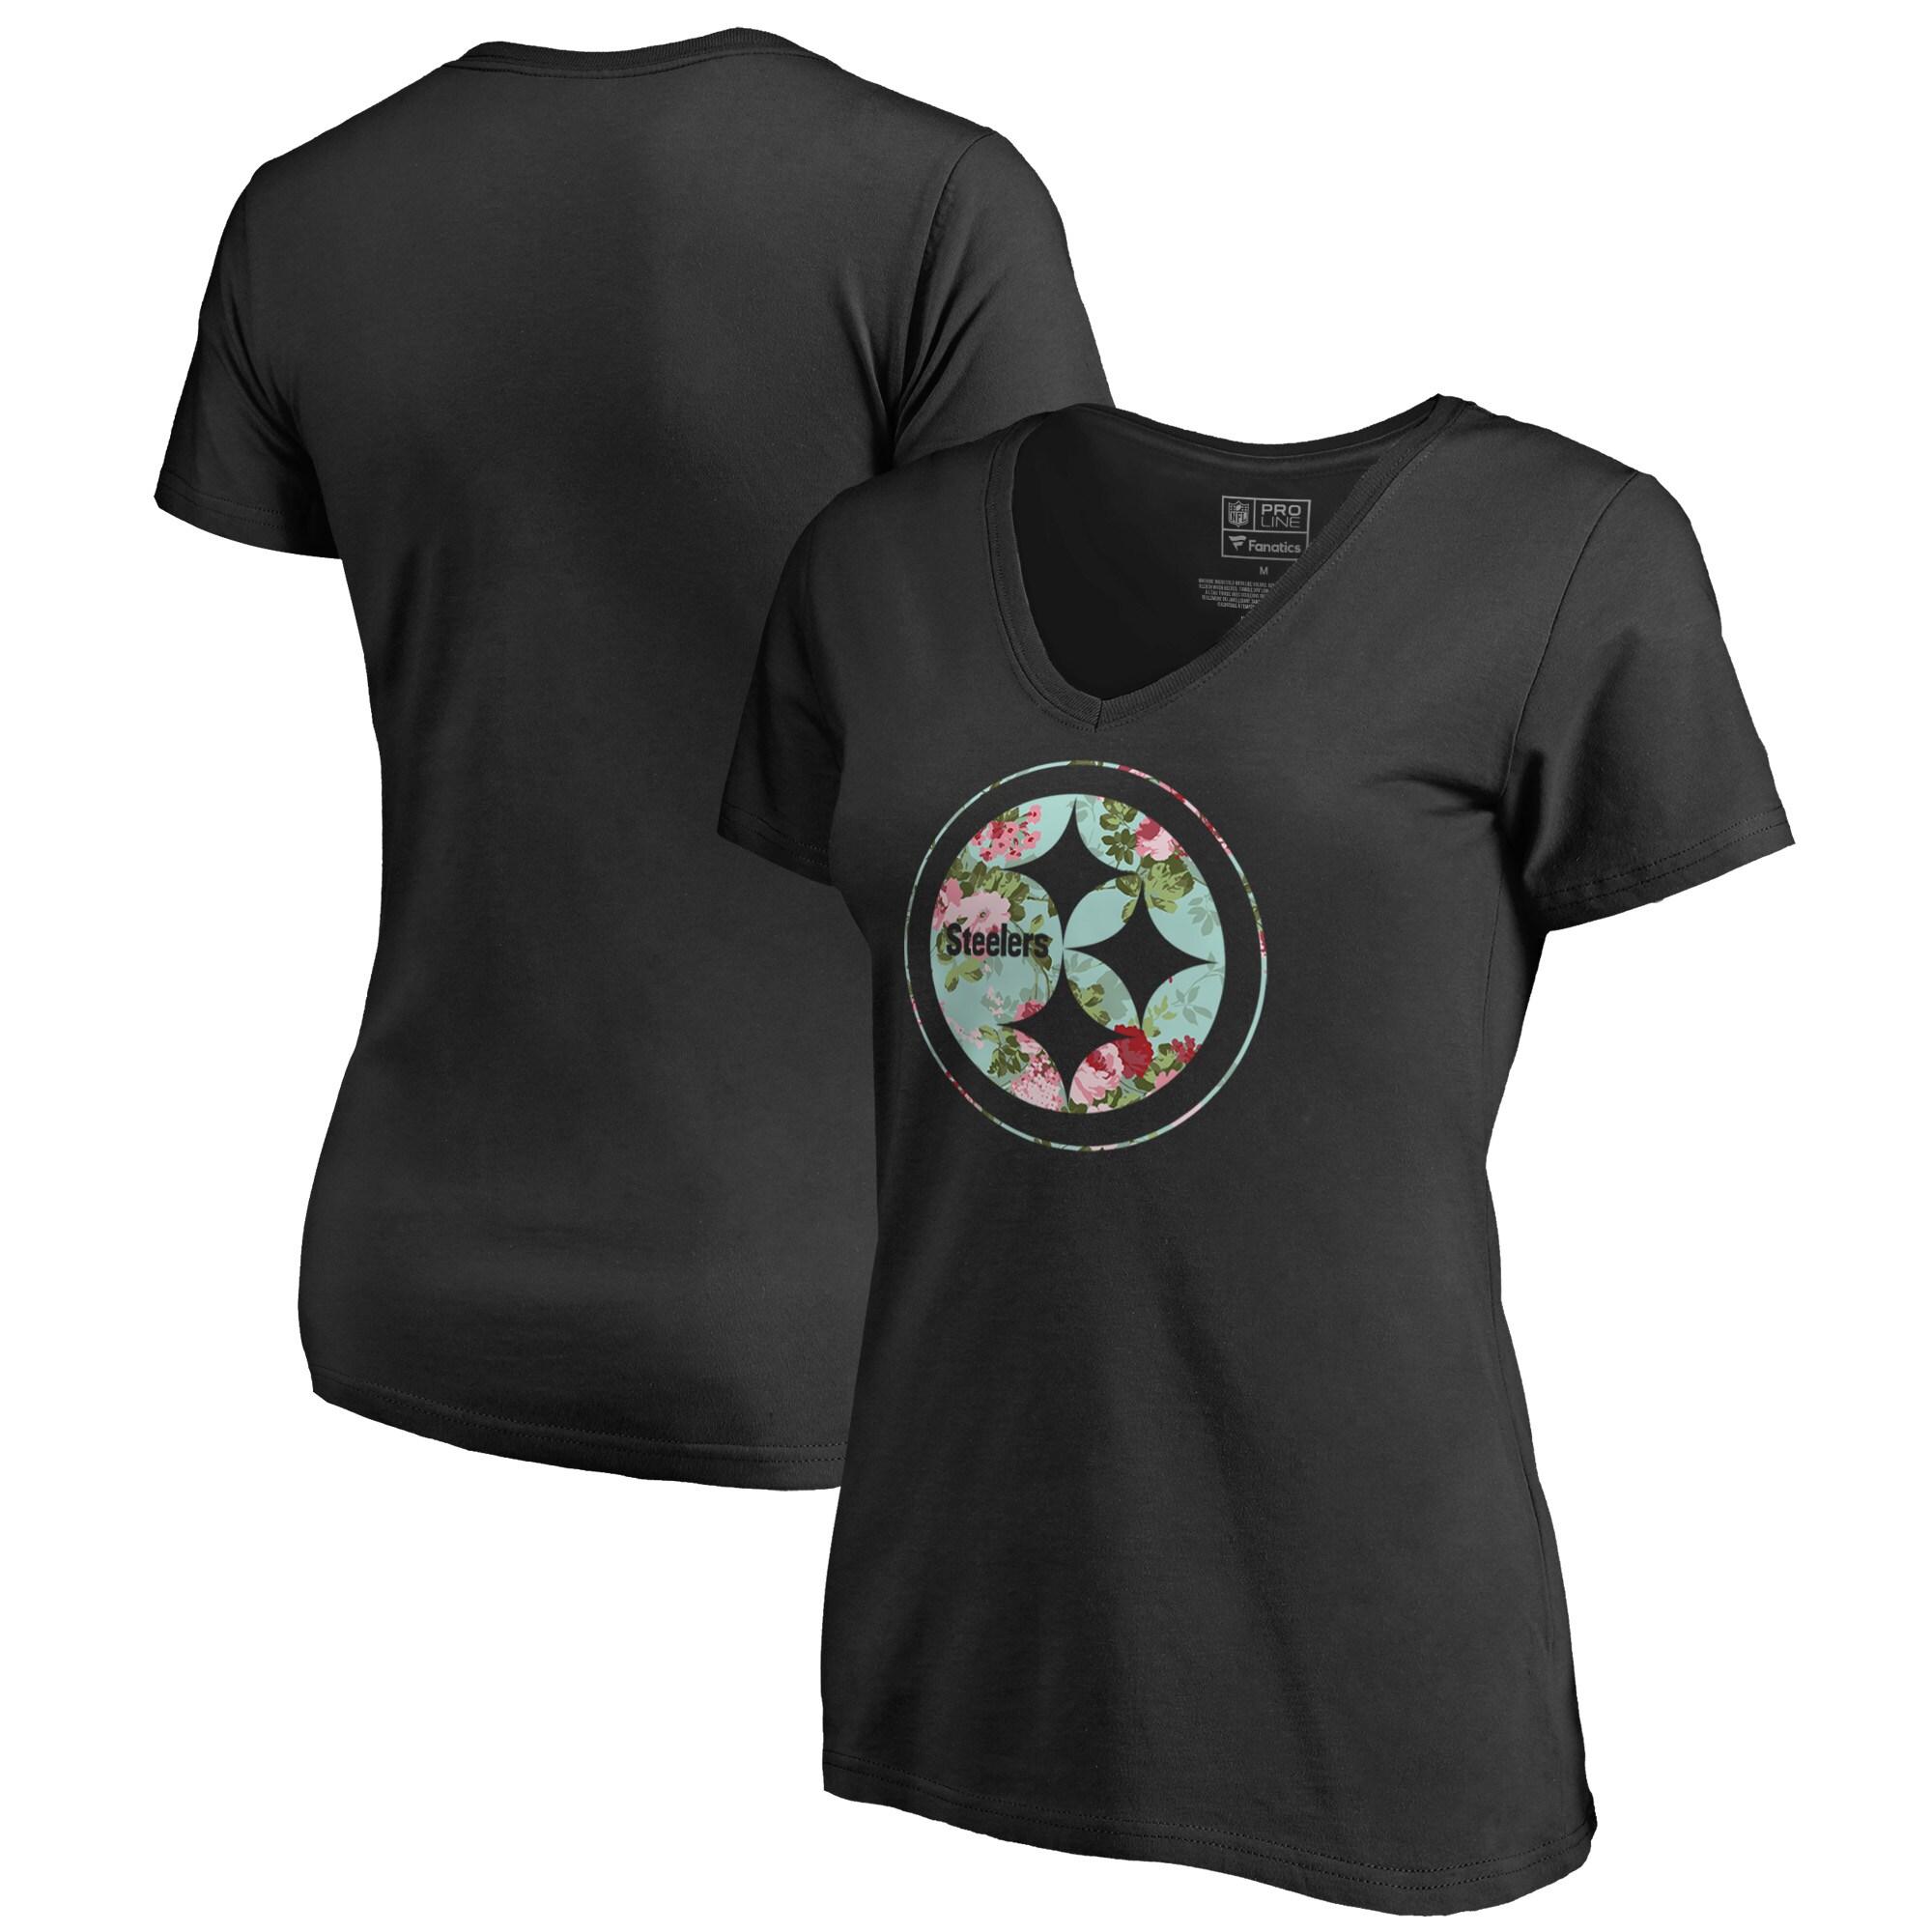 Pittsburgh Steelers NFL Pro Line by Fanatics Branded Women's Lovely V-Neck T-Shirt - Black